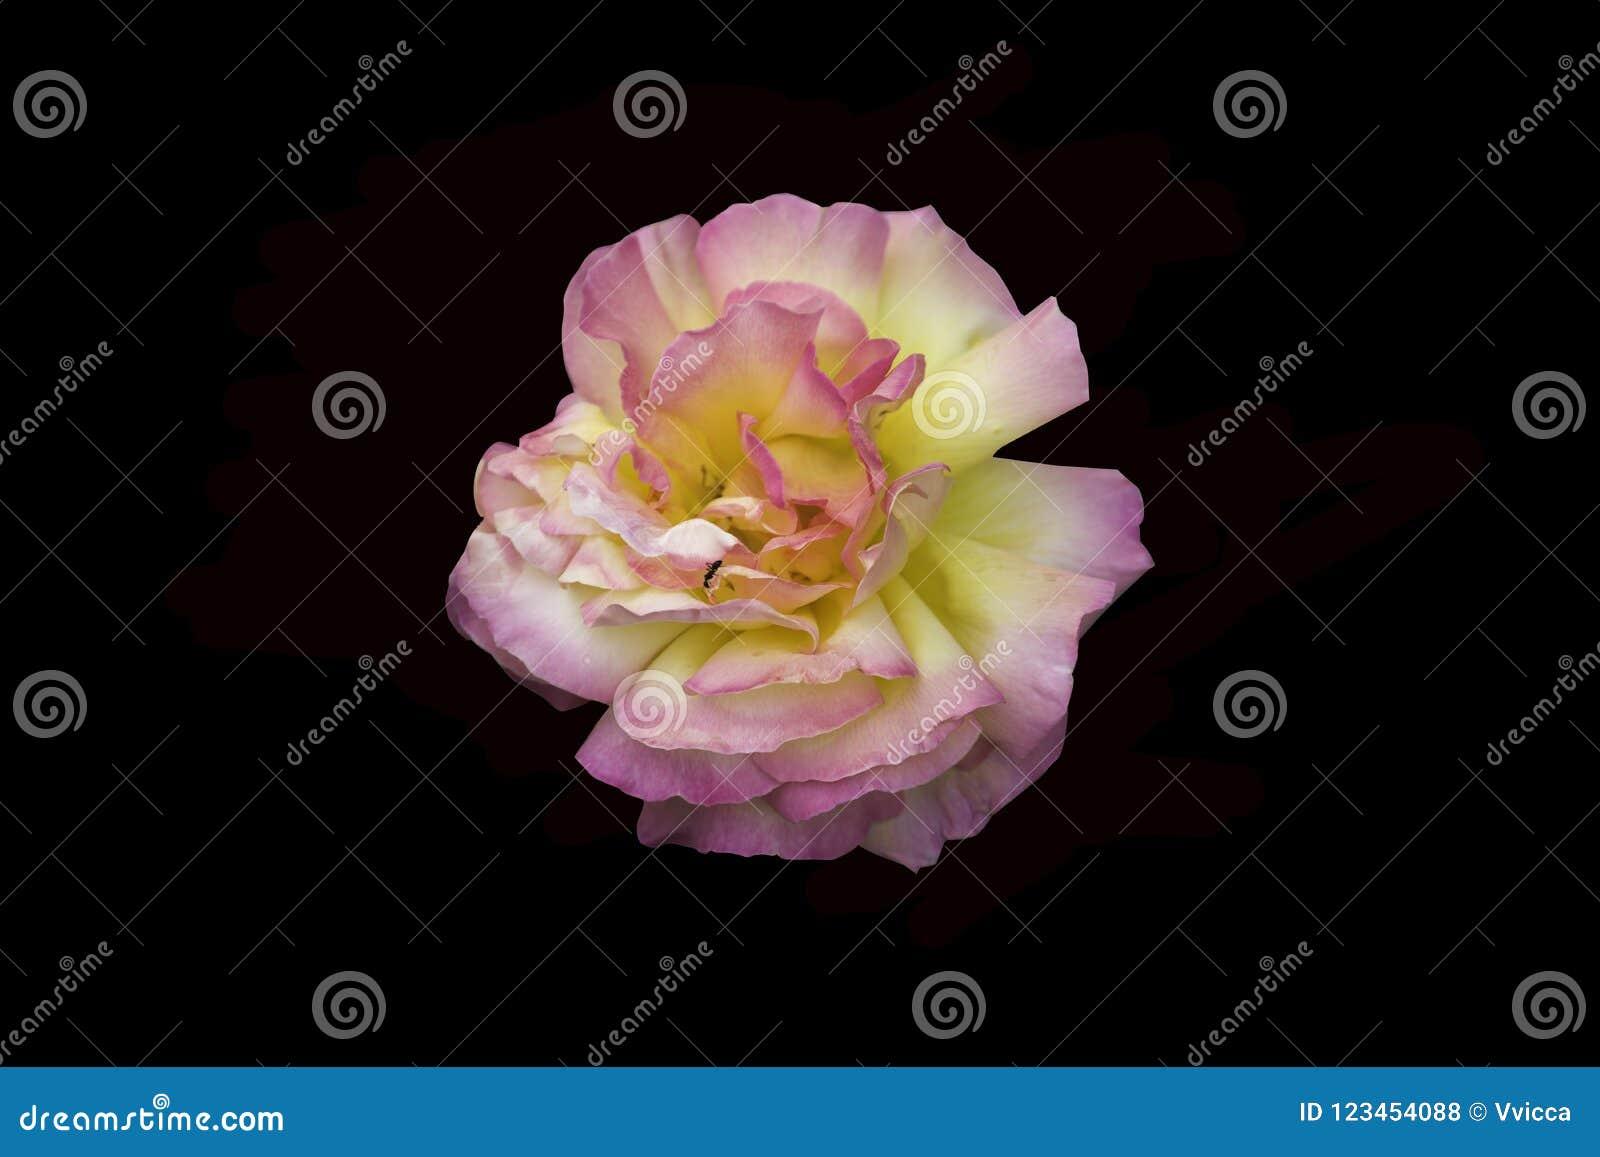 Lush yellow rose flower on black ibackground.